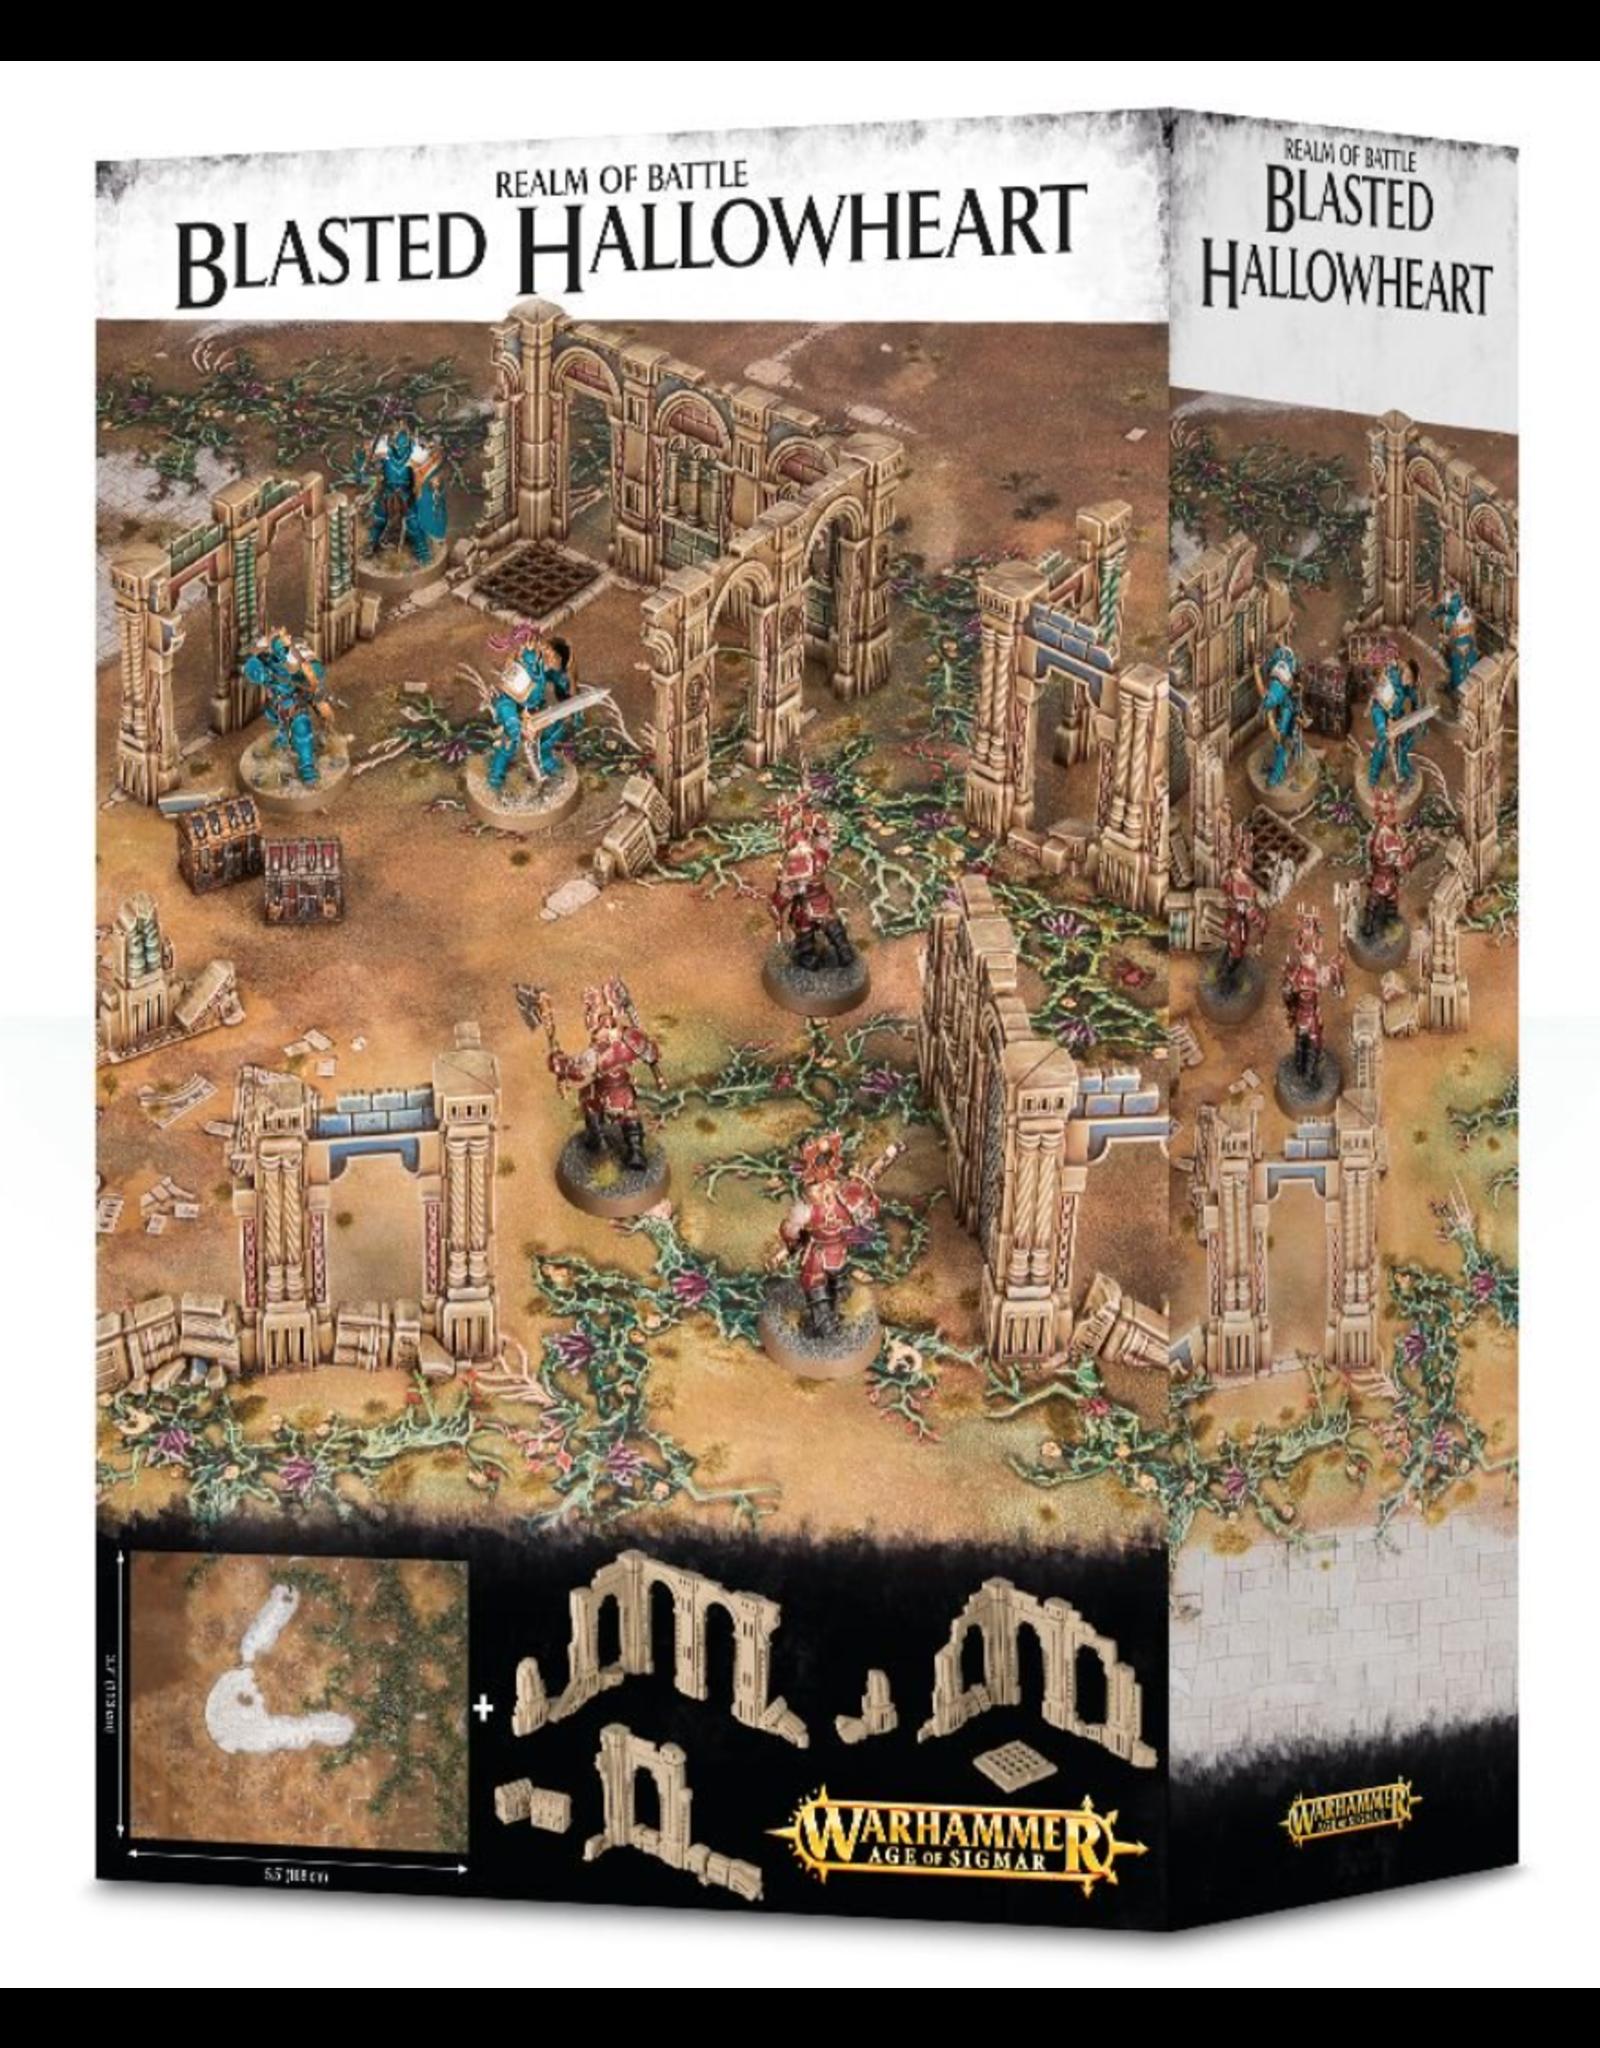 Warhammer 40K Realm of Battle: Blasted Hallowheart